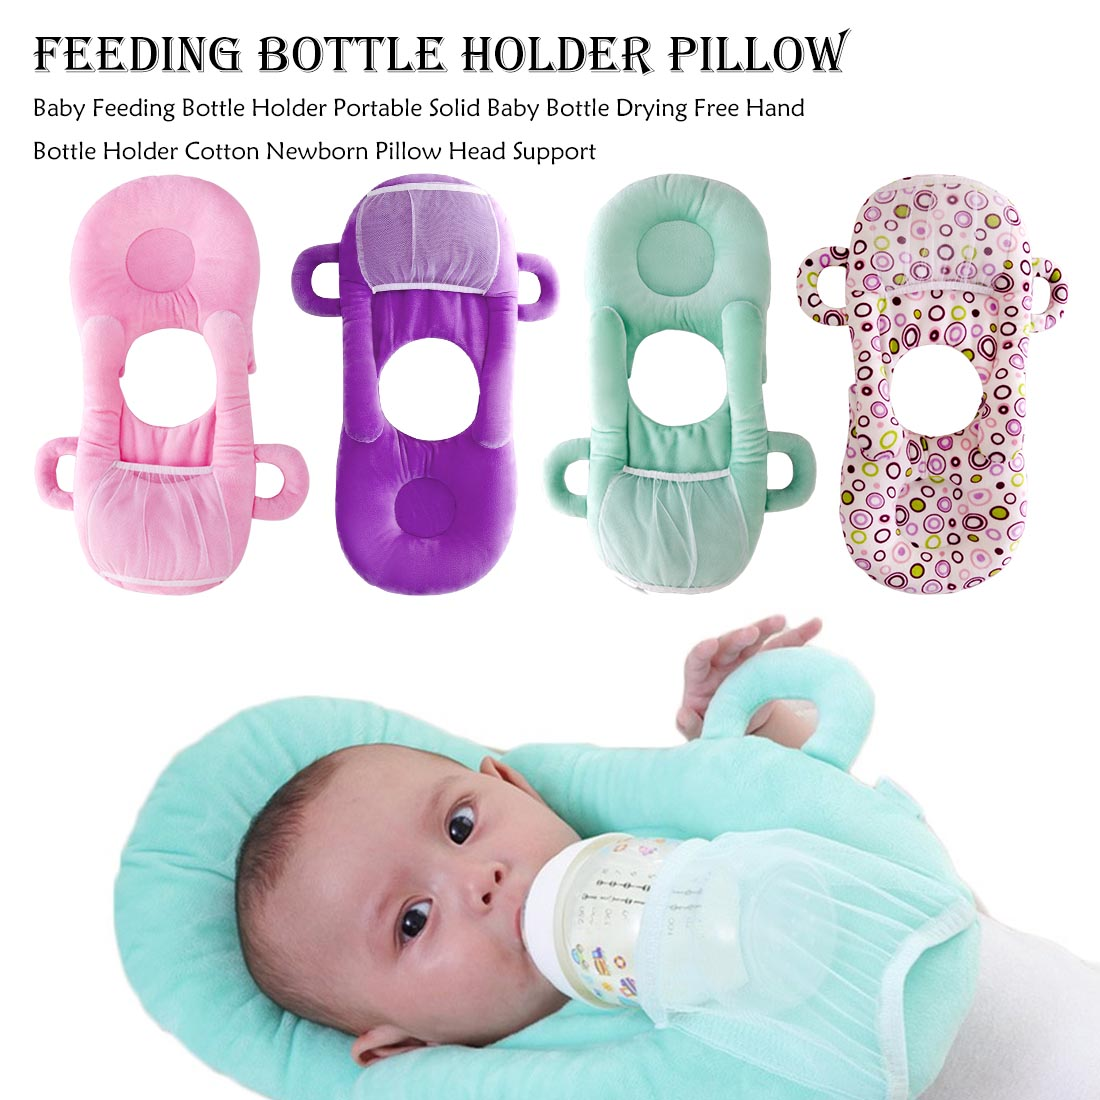 Hot Infant Learning Nursing Pillow Cushion Free Hand Bottle Holder Cotton Baby Milk Bottle Feeding Cup Baby Bottle Rack